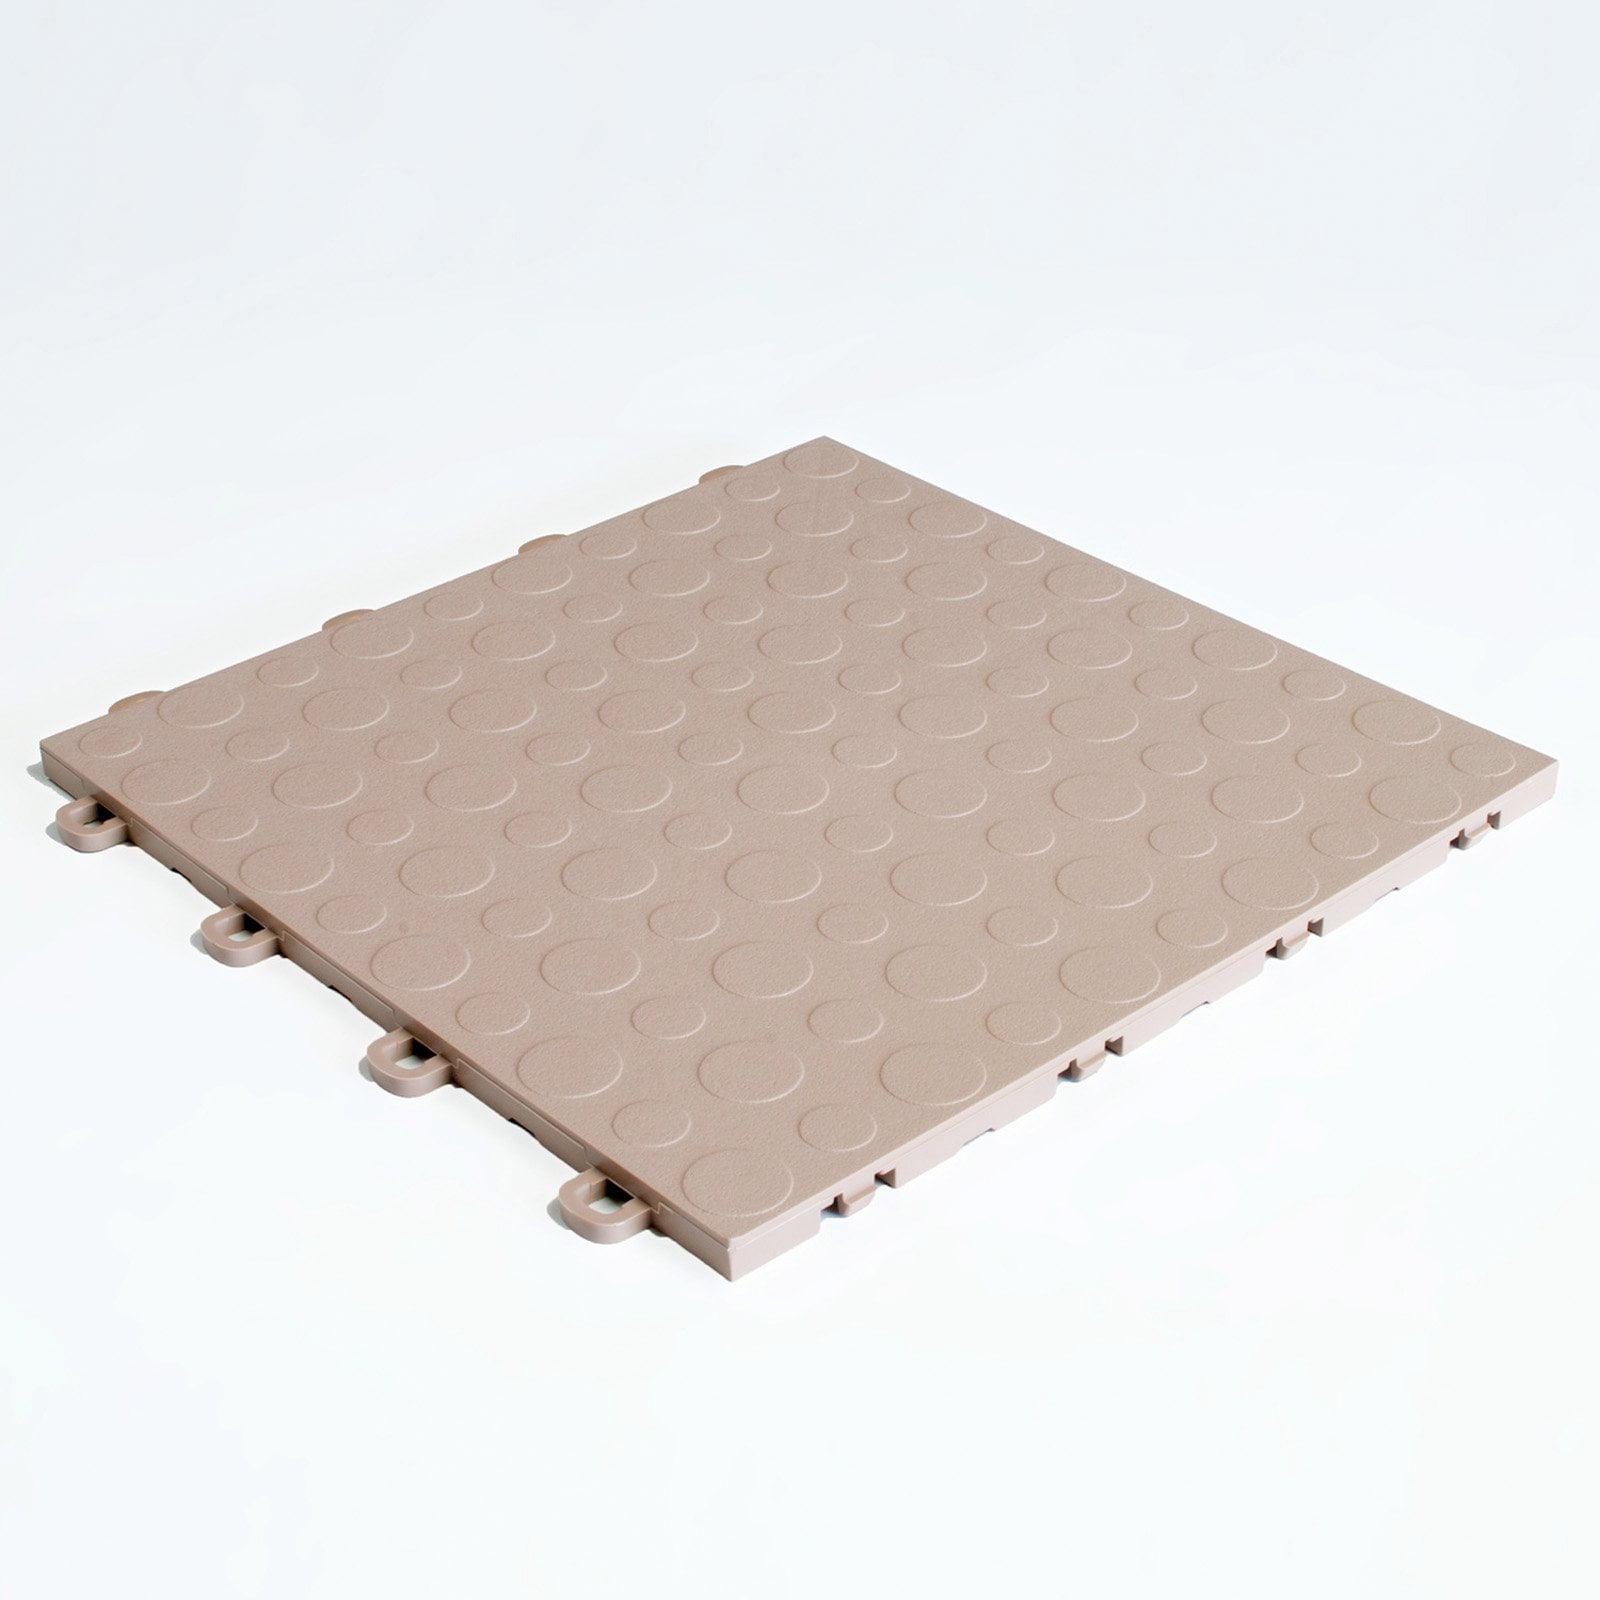 Blocktile modular interlocking garage floor tiles set of 30 12 blocktile modular interlocking garage floor tiles set of 30 12 x 12 each walmart dailygadgetfo Image collections